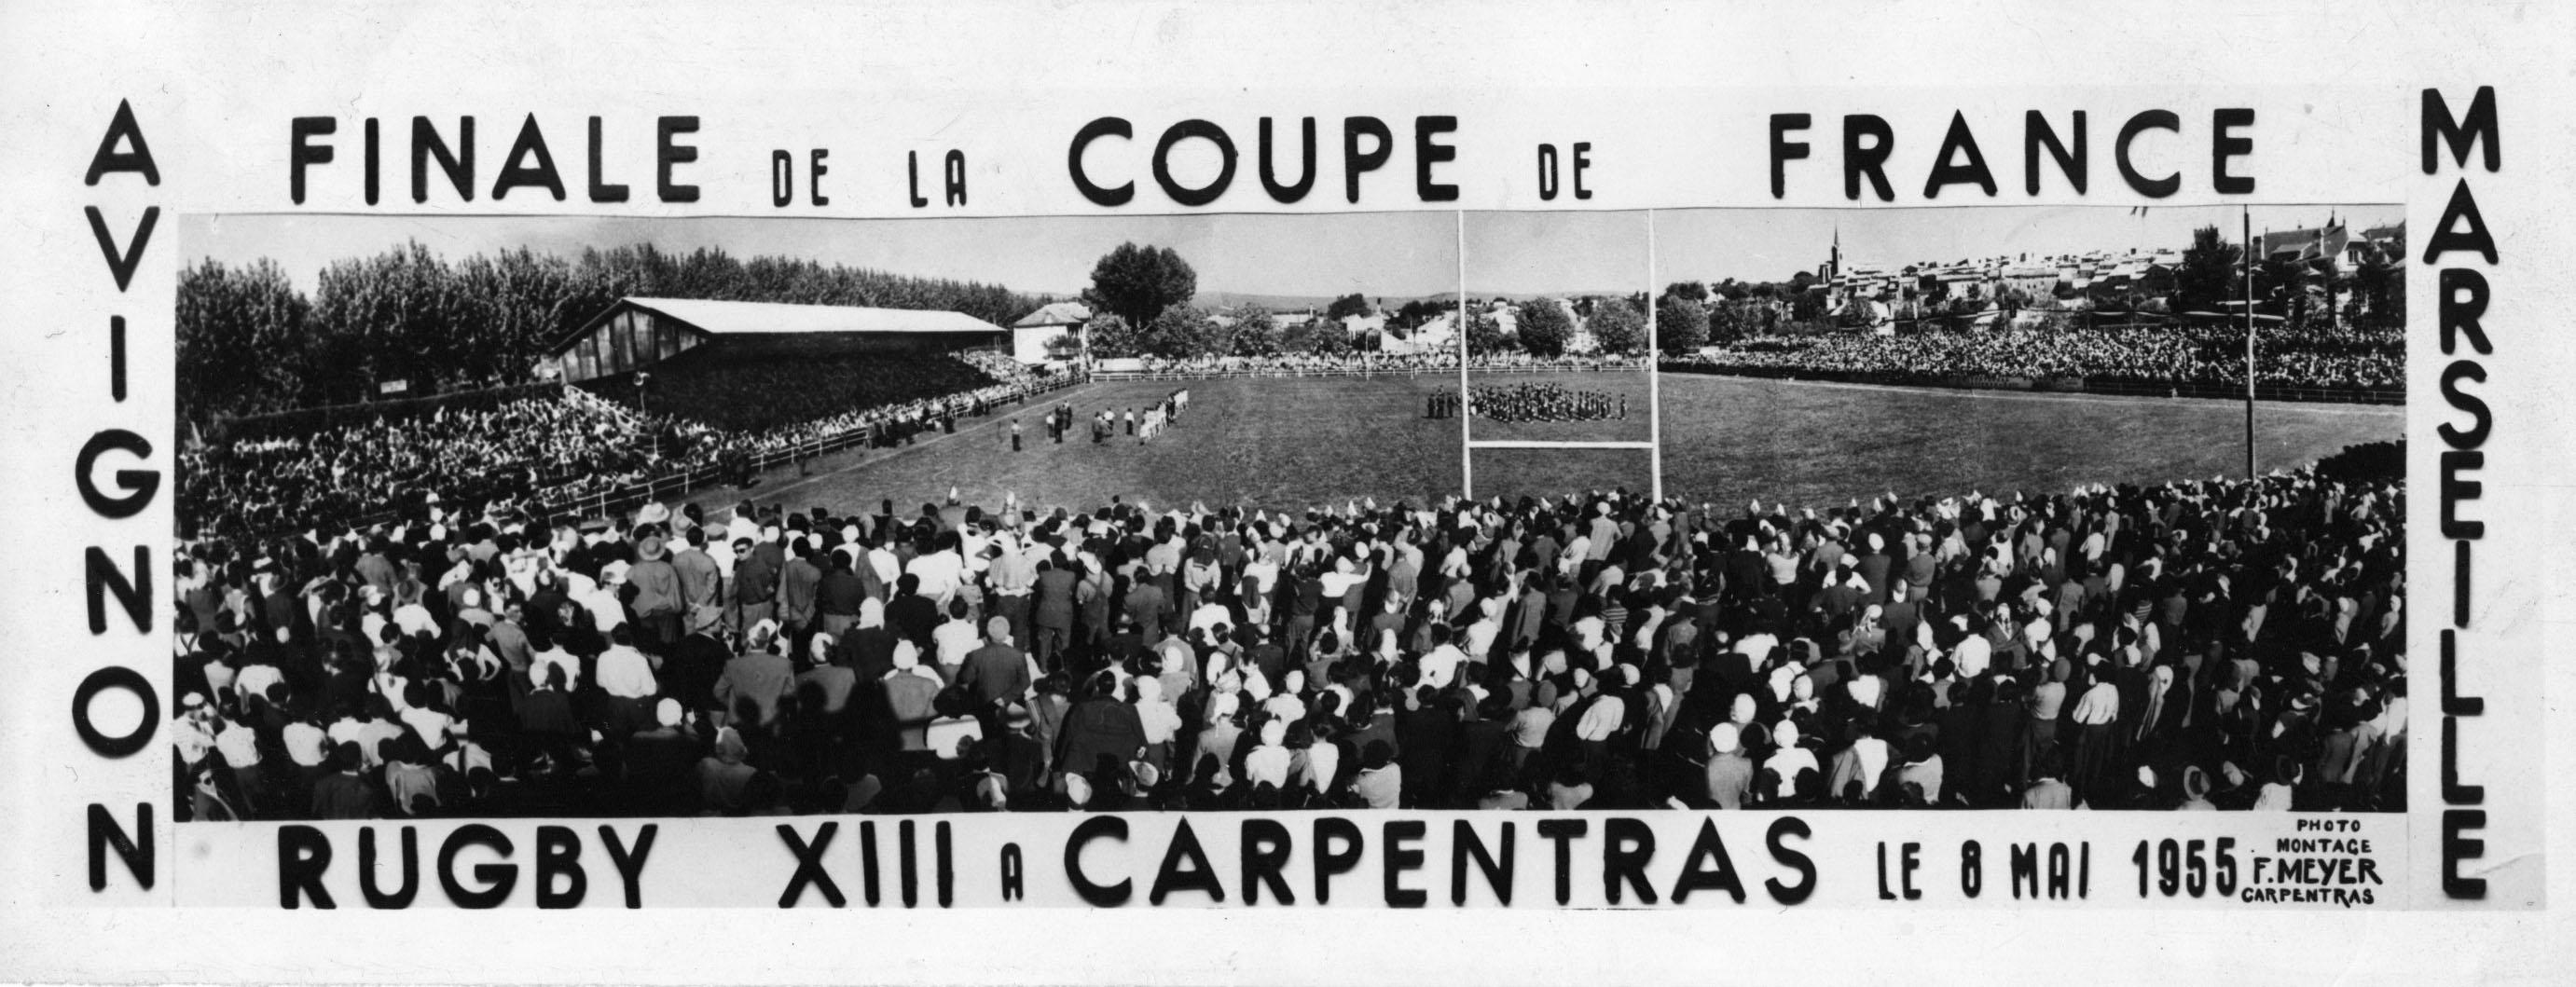 Coupe de France 1955. SOA 18 Marseille XIII 10.